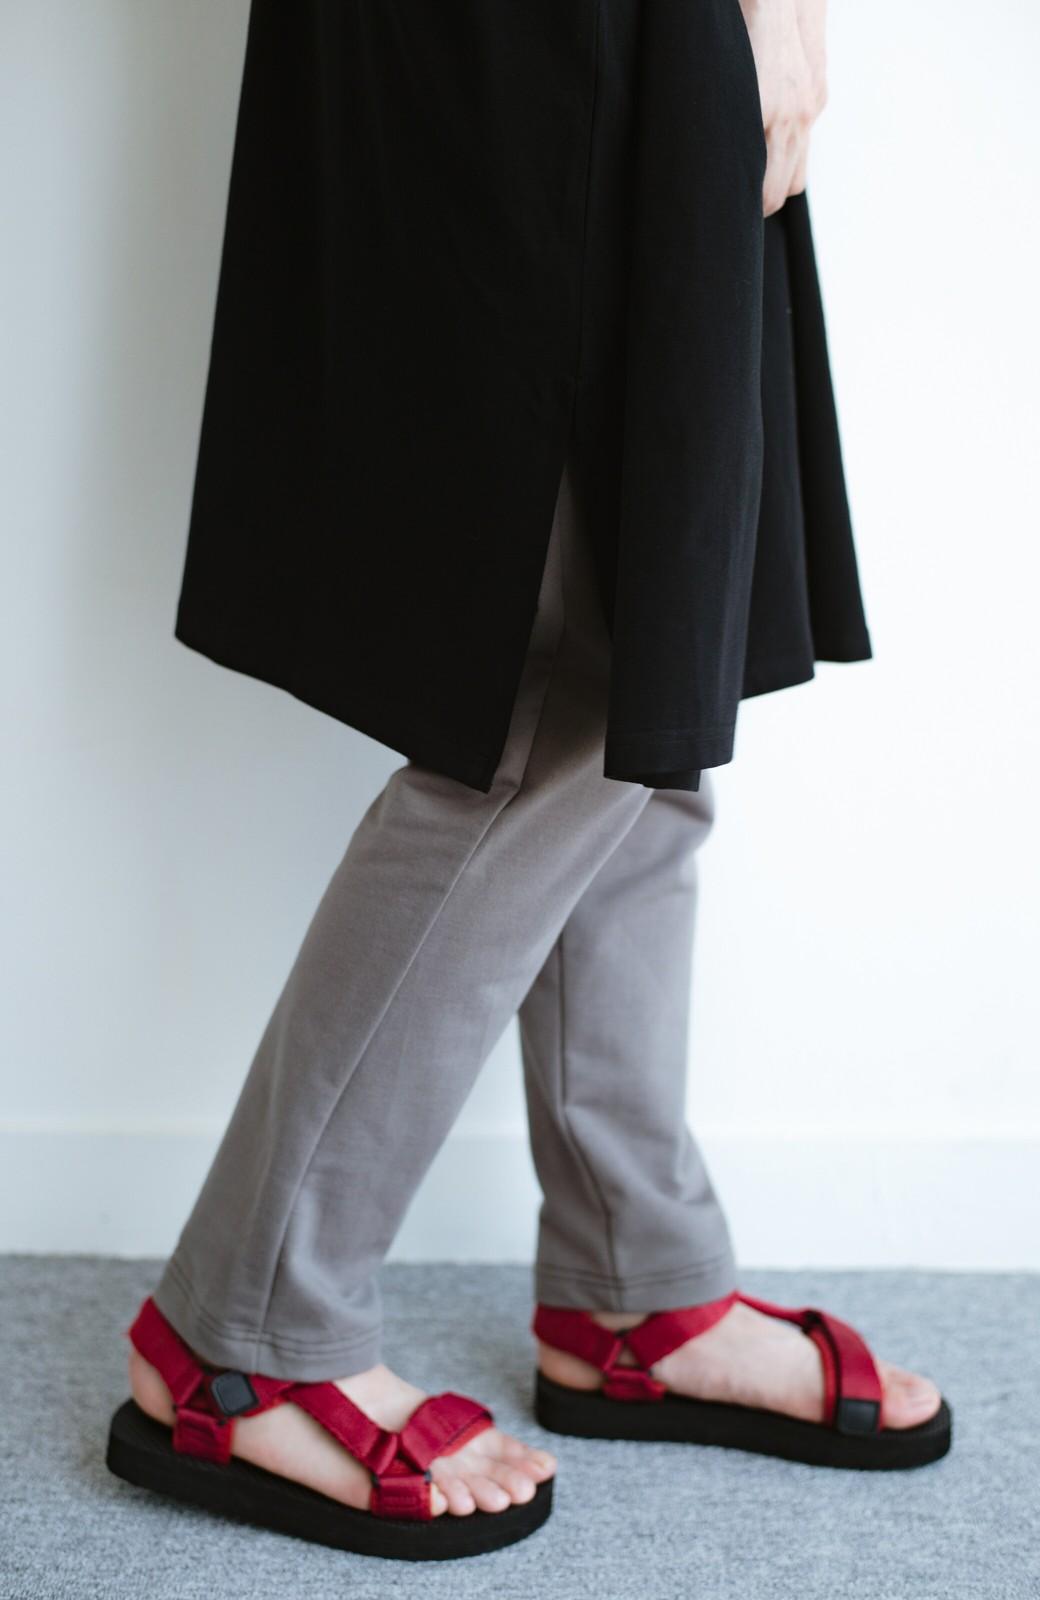 haco! PBPオーガニックコットンのとにかく動きやすくてラクチンなTシャツワンピース&レギンスセット【まったり期~もやもや期】女の子バンザイ!プロジェクト <ブラック>の商品写真8